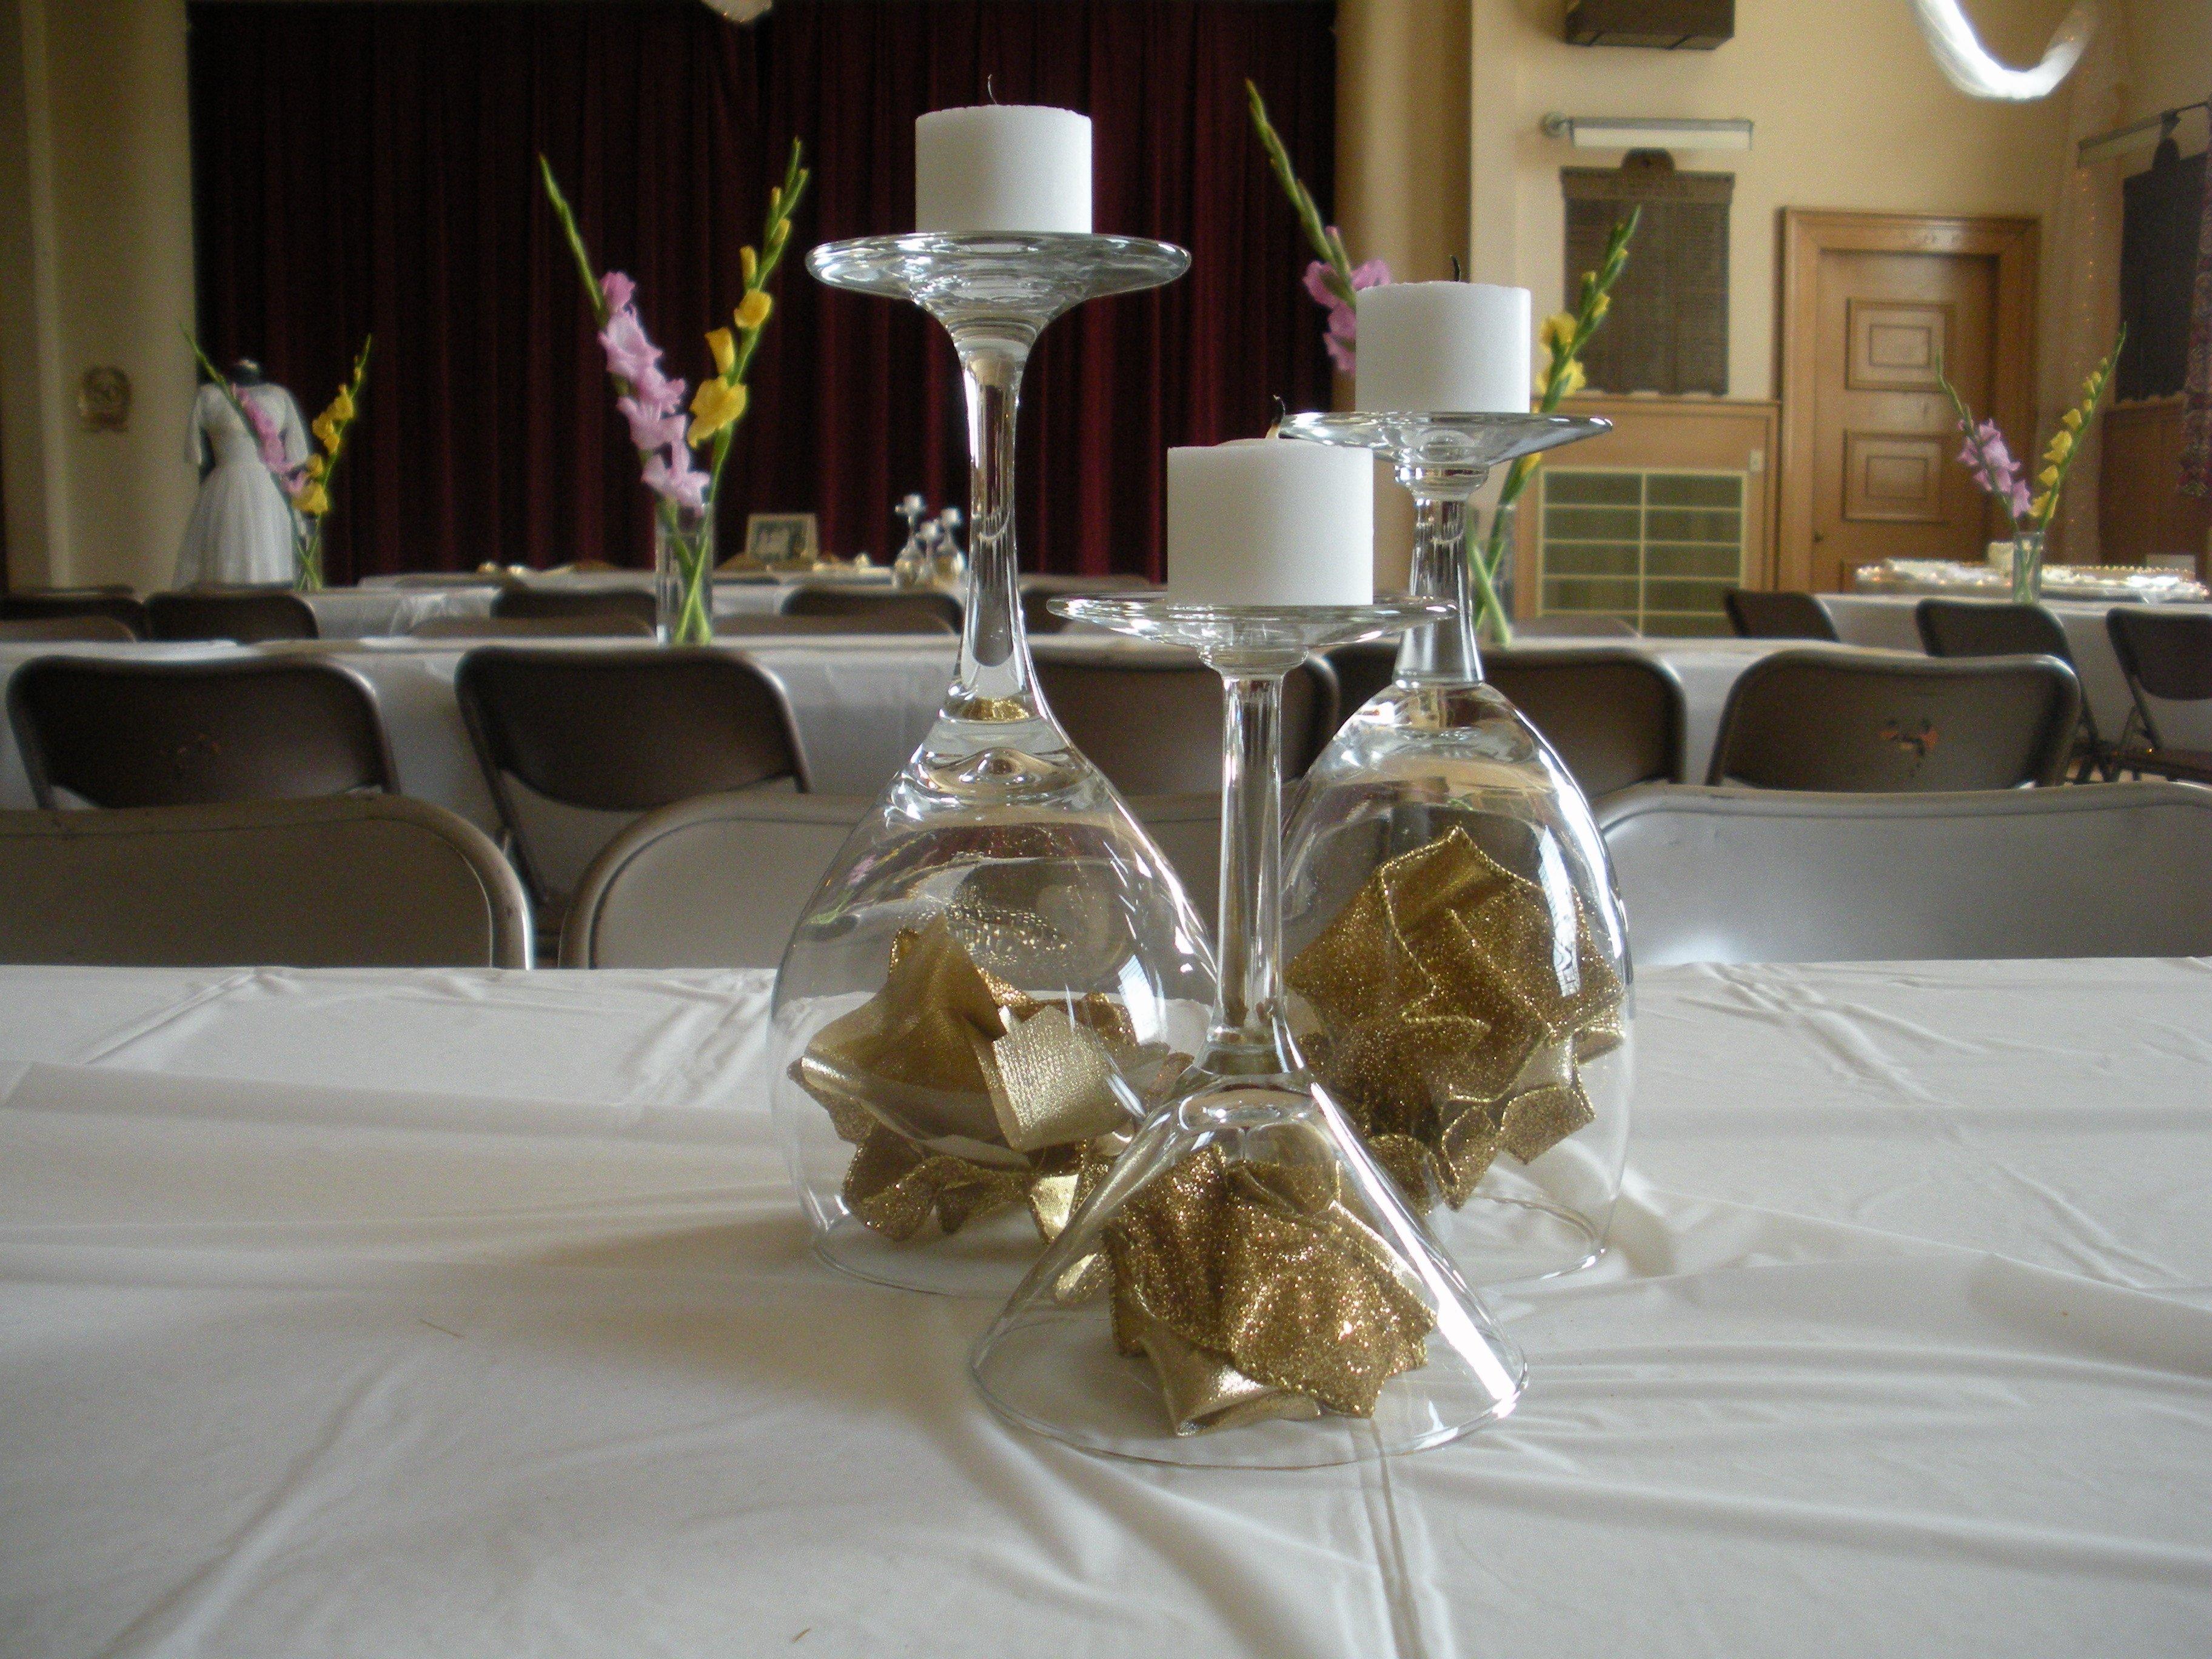 10 Pretty 50Th Wedding Anniversary Party Ideas download 50th wedding anniversary decorations to make wedding corners